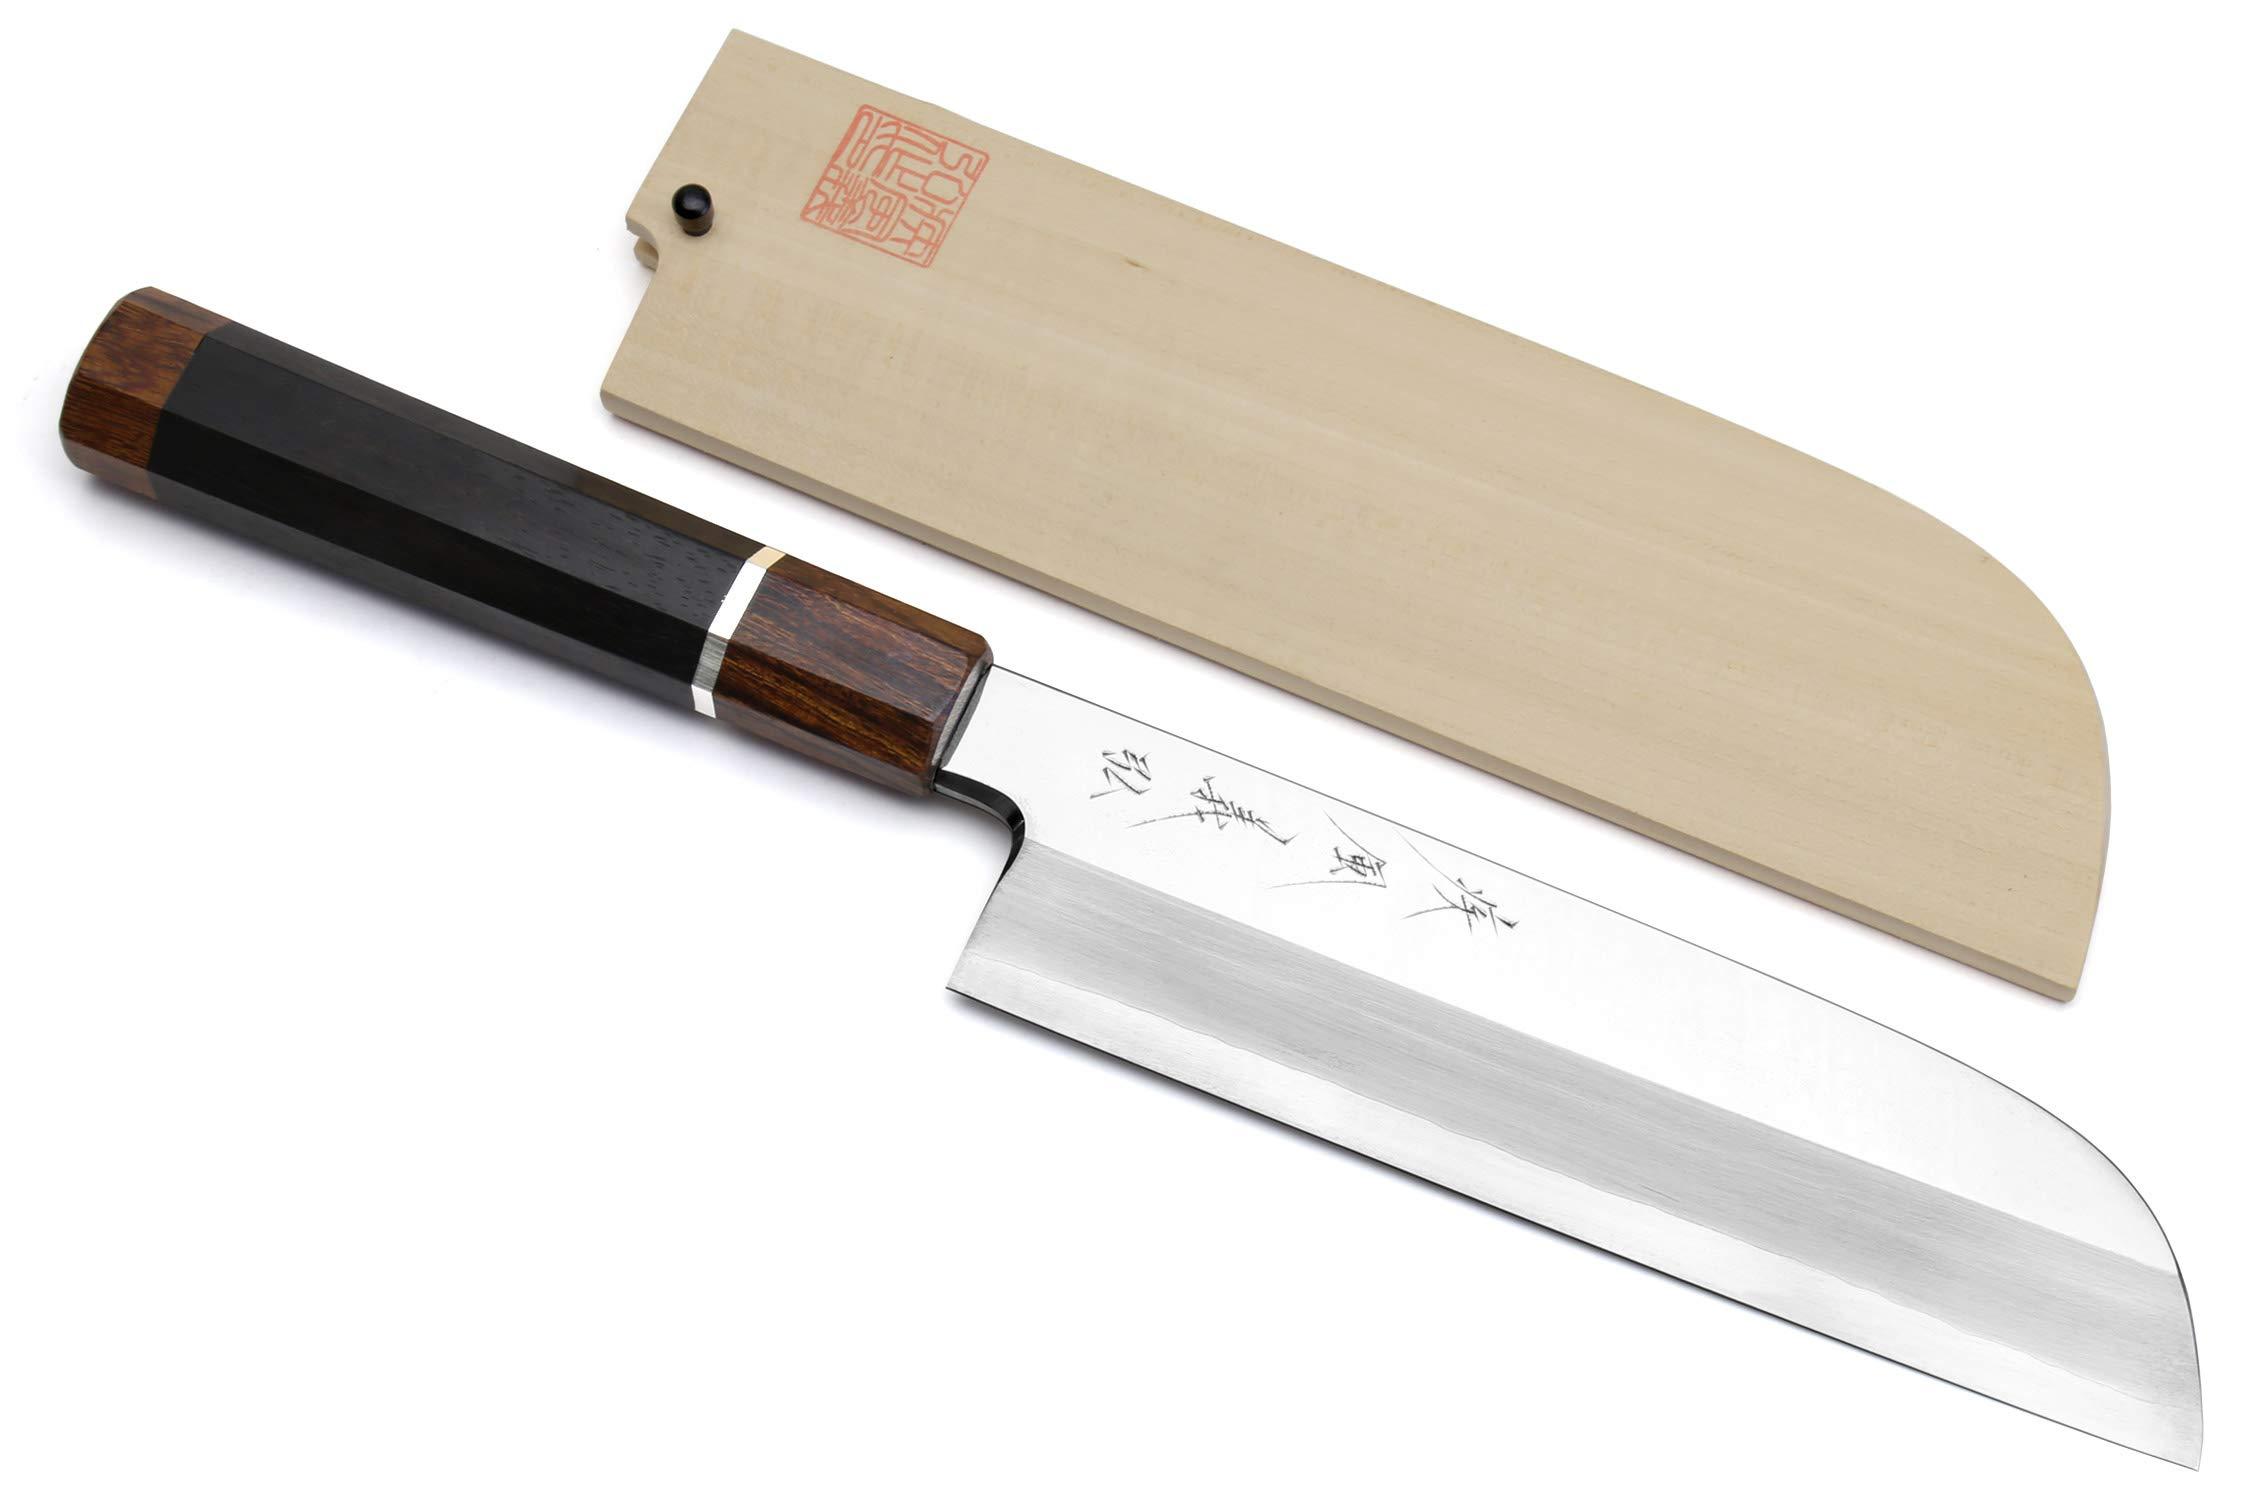 Yoshihiro Ginsanko Mirror Polished Stain Resistant Kama Usuba Traditional Japanese Vegetable Chopping Chef Knife Ebony Handle with Silver Ring (7.5'' (195mm))